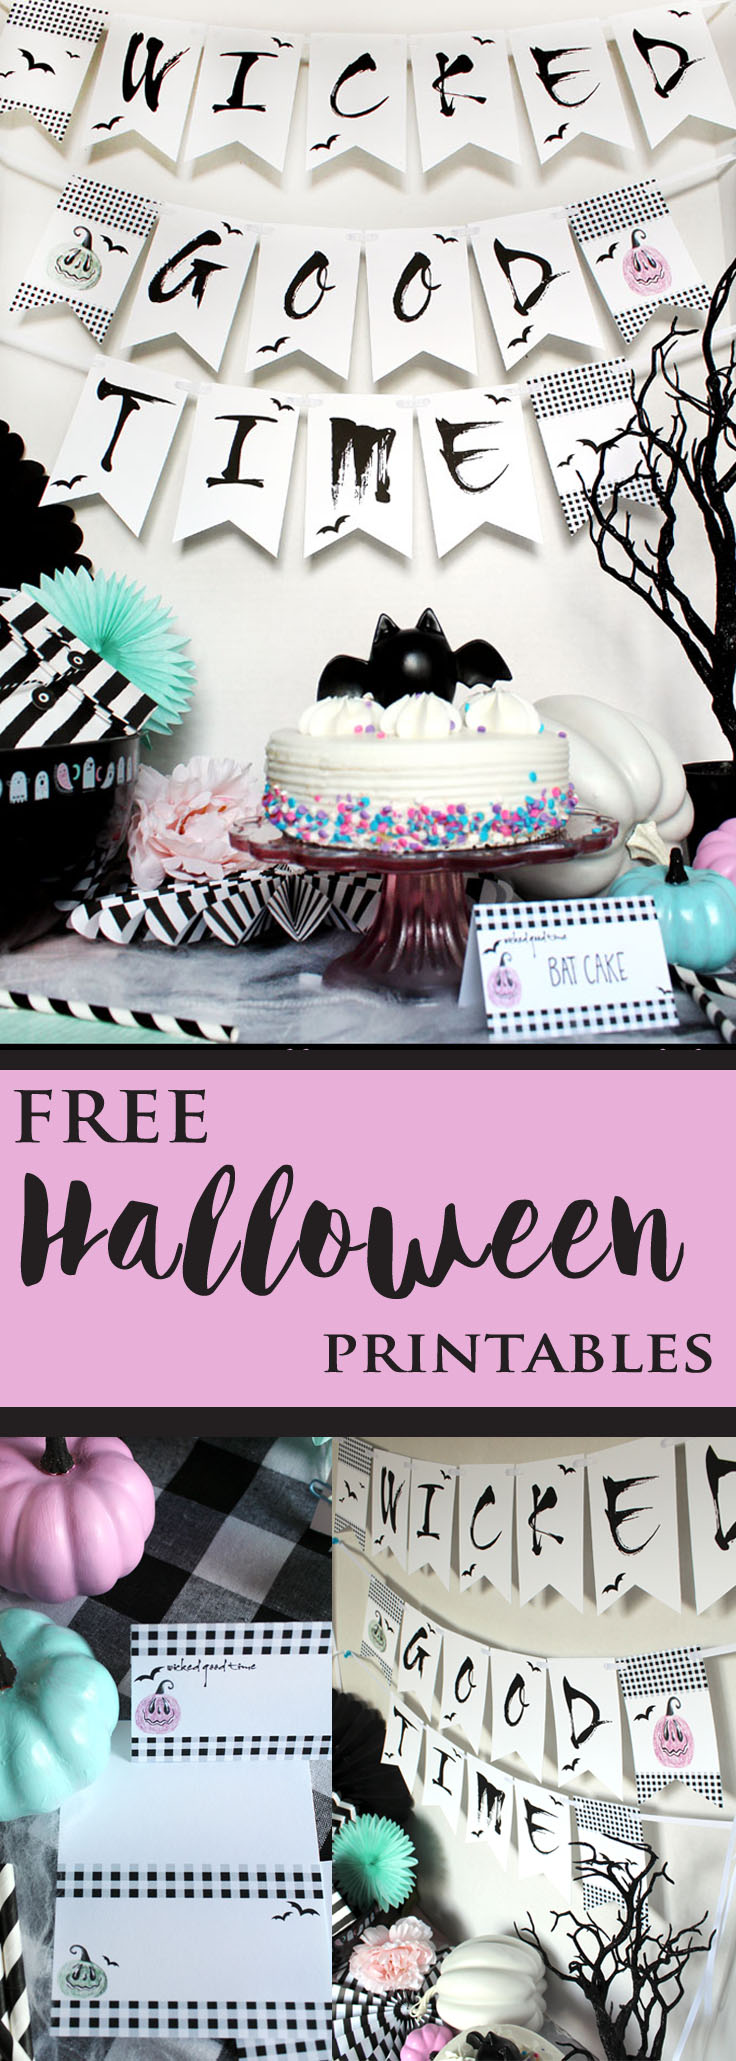 Halloween printables pinterest